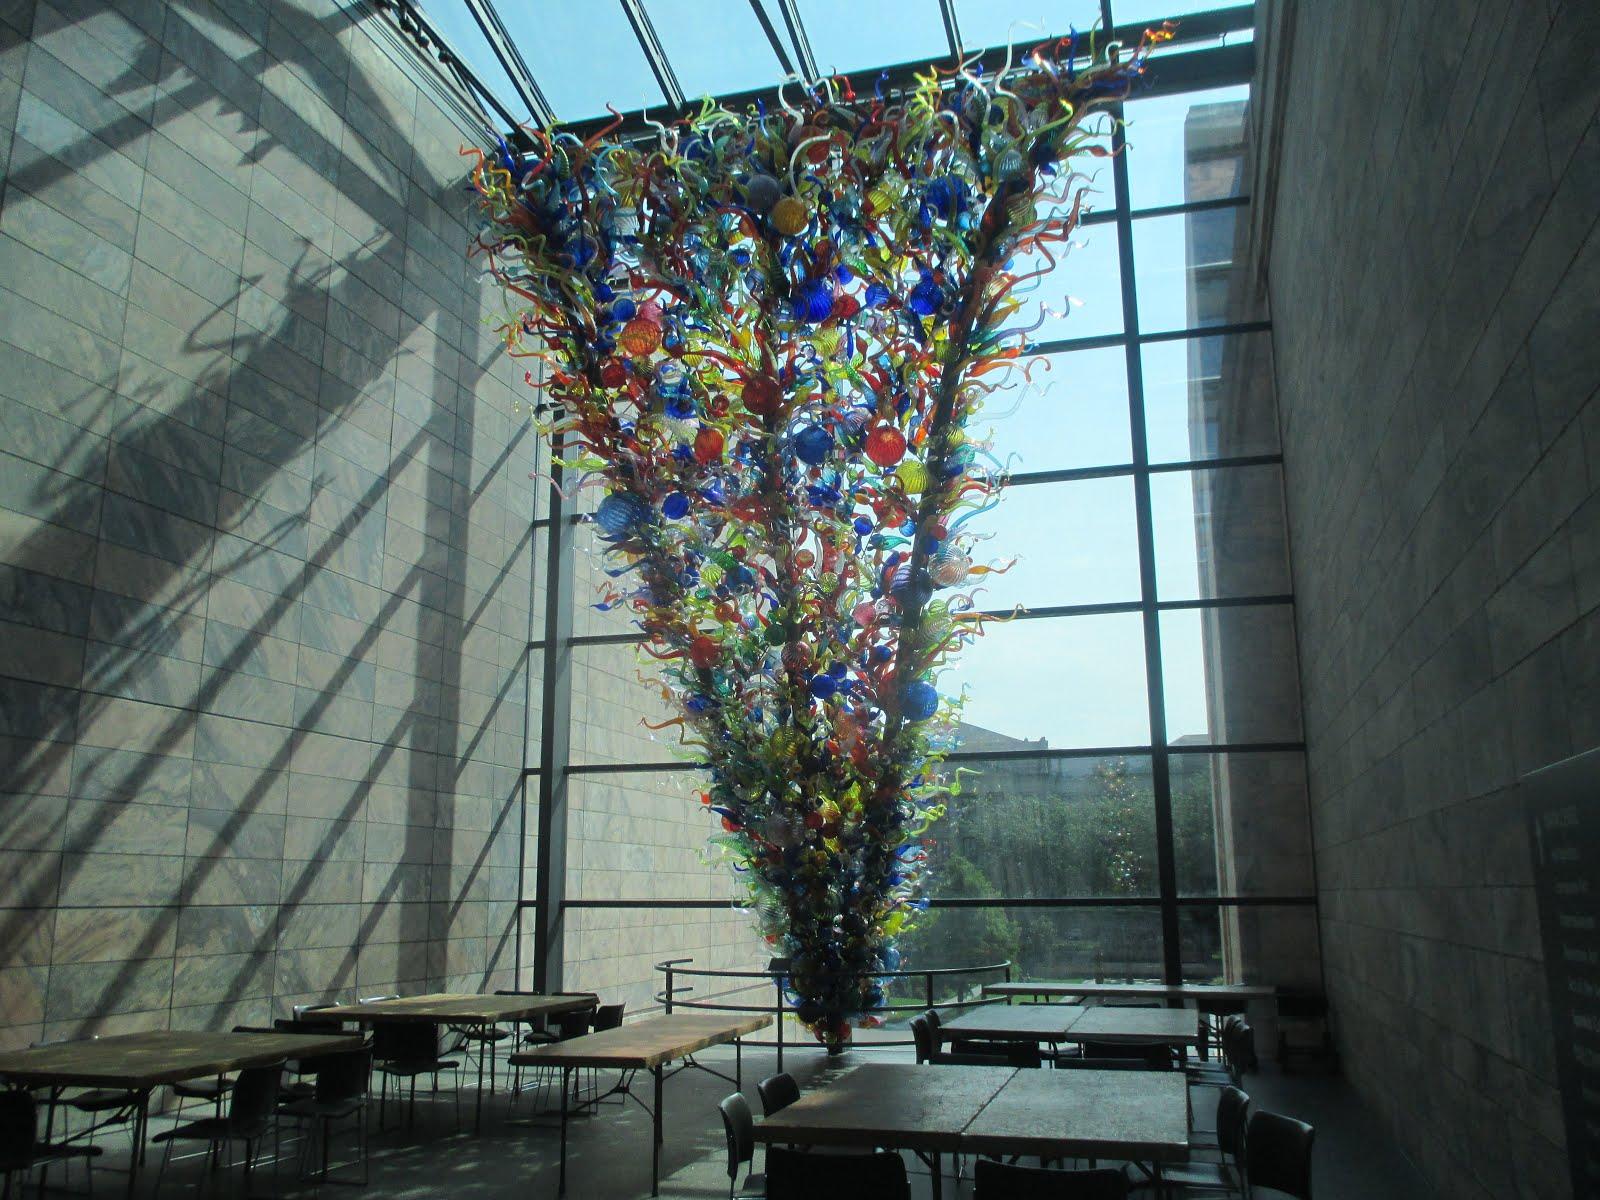 OMAHA JOSLYN ART MUSEUM